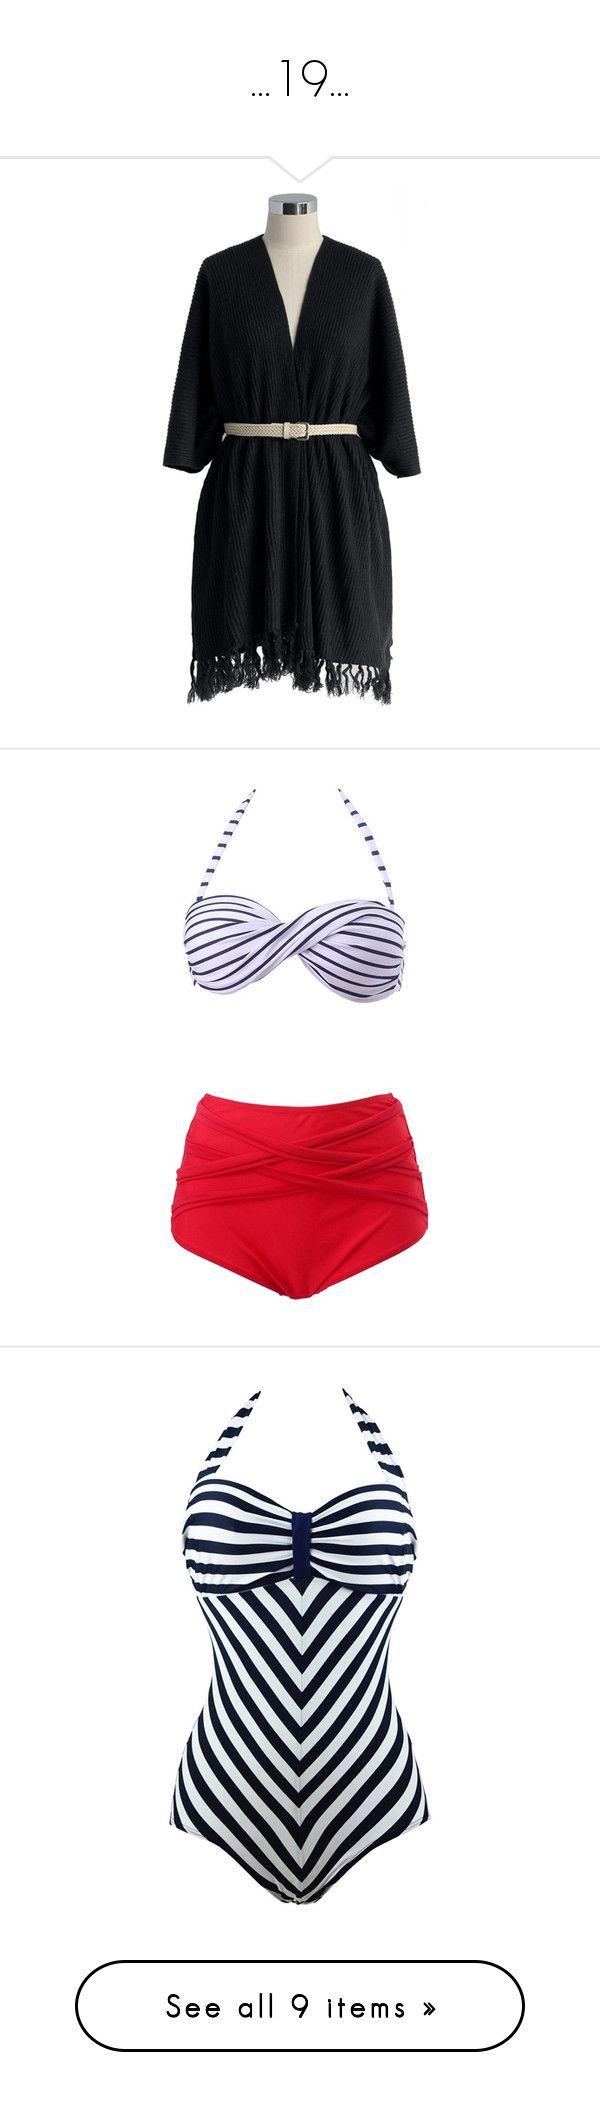 """...19..."" by daviiriiann ❤ liked on Polyvore featuring outerwear, black, cape coat, swimwear, bikinis, high waisted bikini, retro high waisted bikini, high waisted swimsuit, retro high waisted swimsuits and red high waisted bikini"